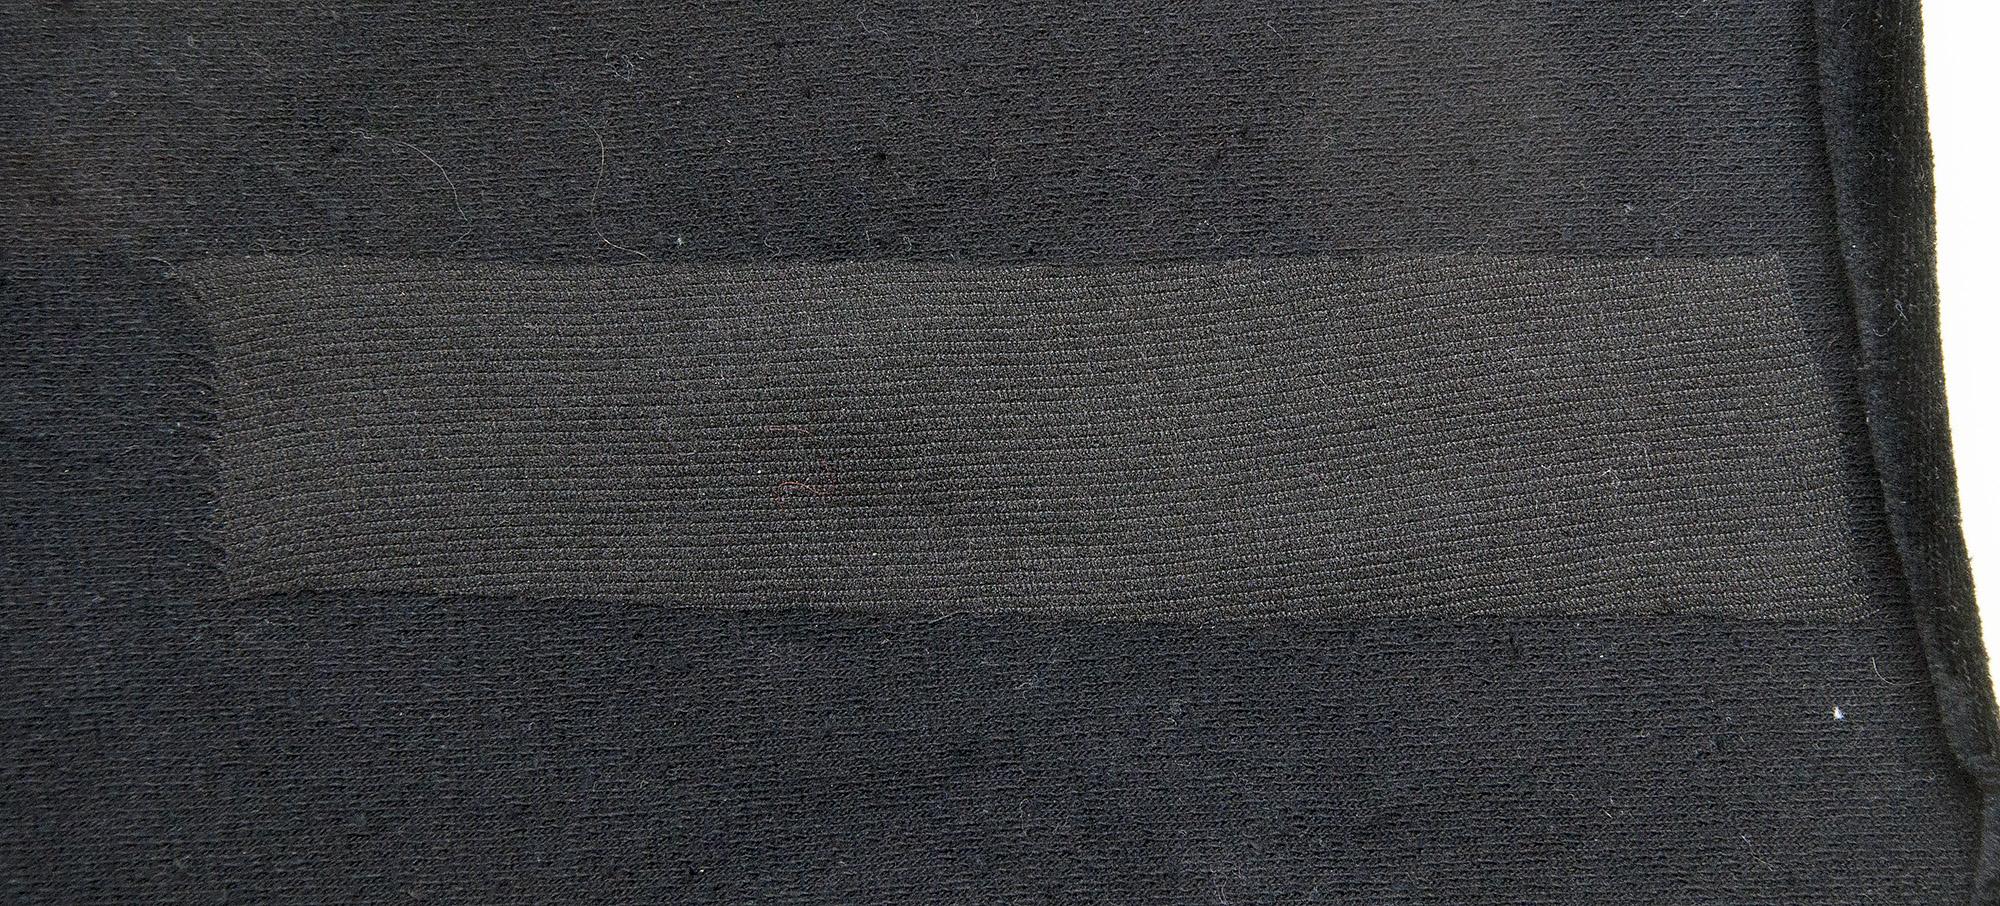 How to do welt pockets on knit fabrics